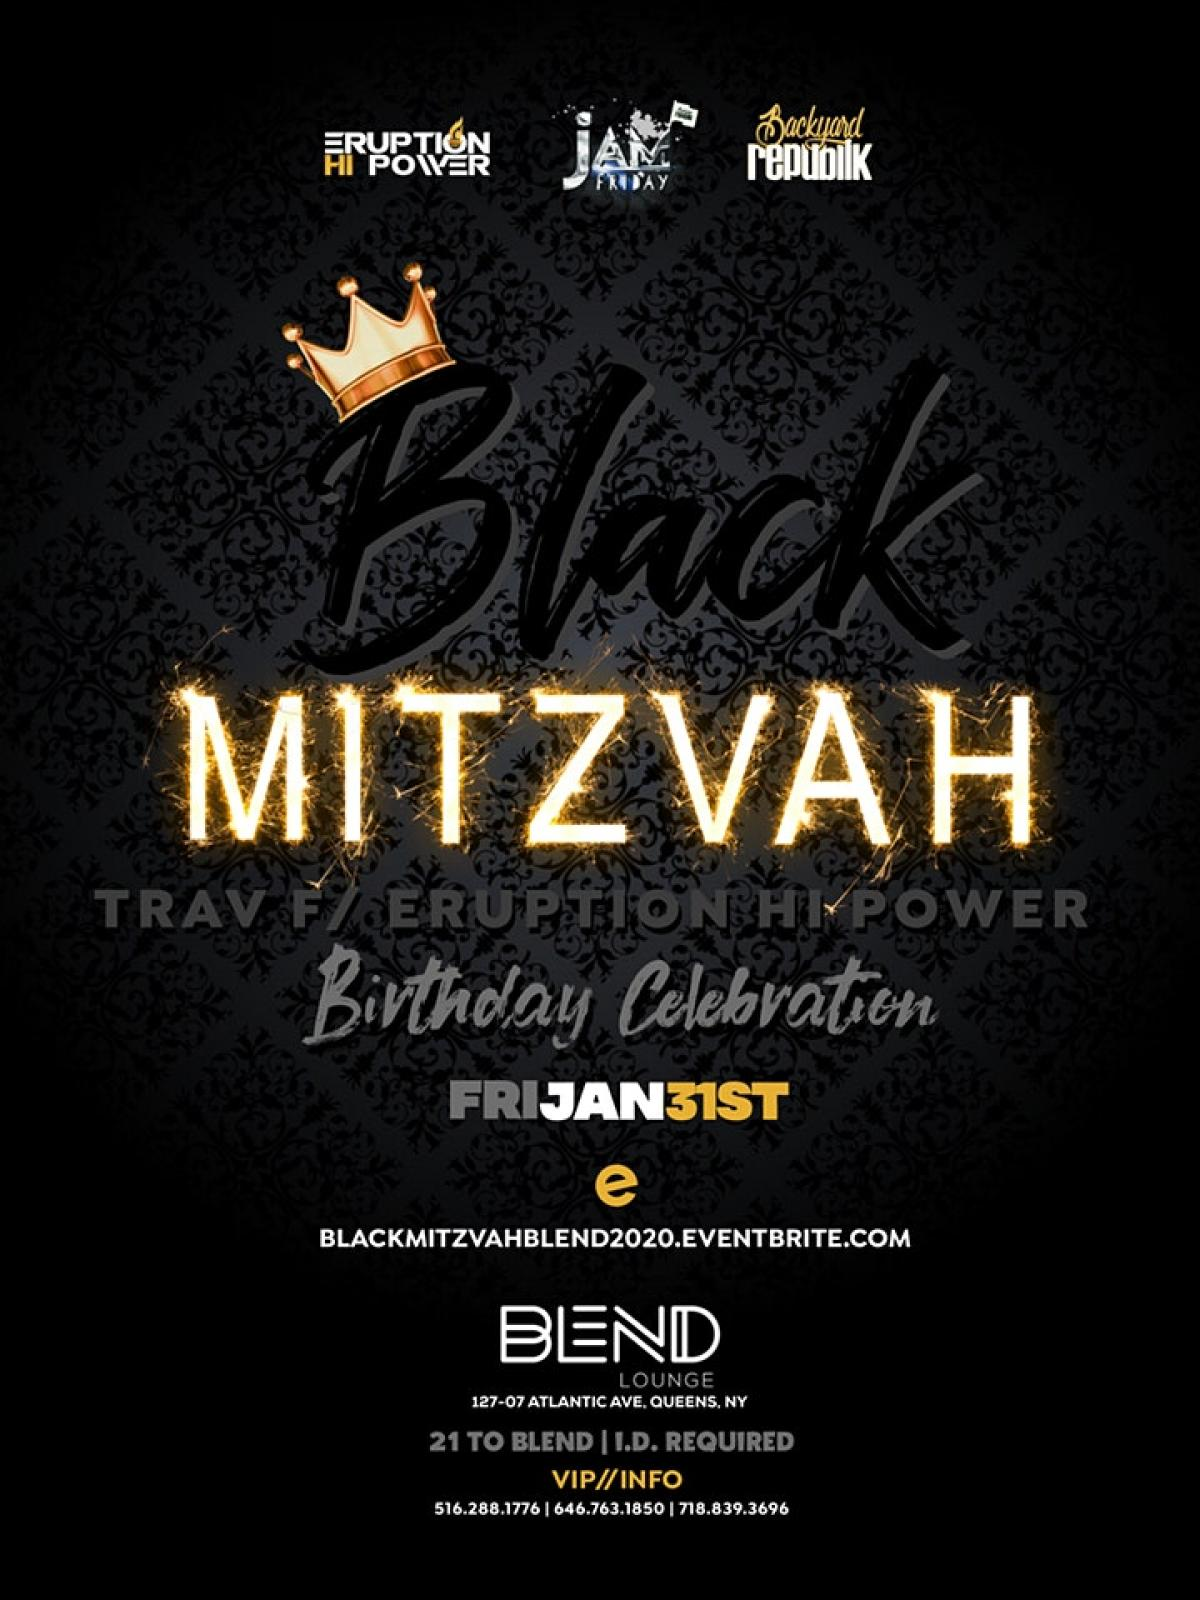 Black Mitzvah flyer or graphic.